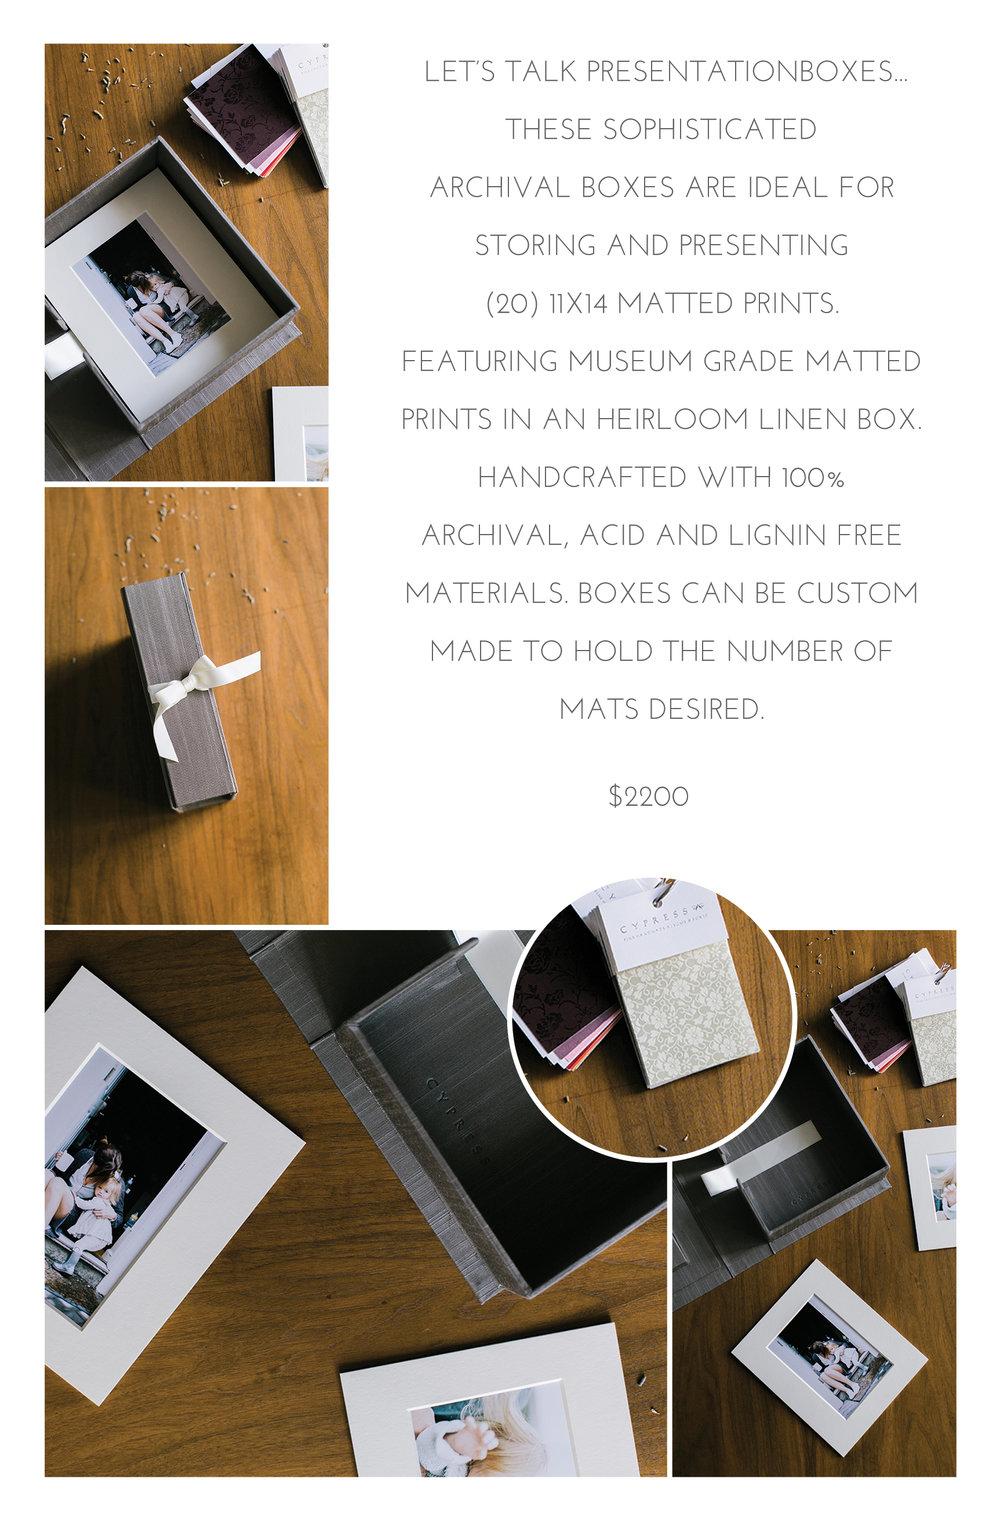 family presentation boxes.jpg